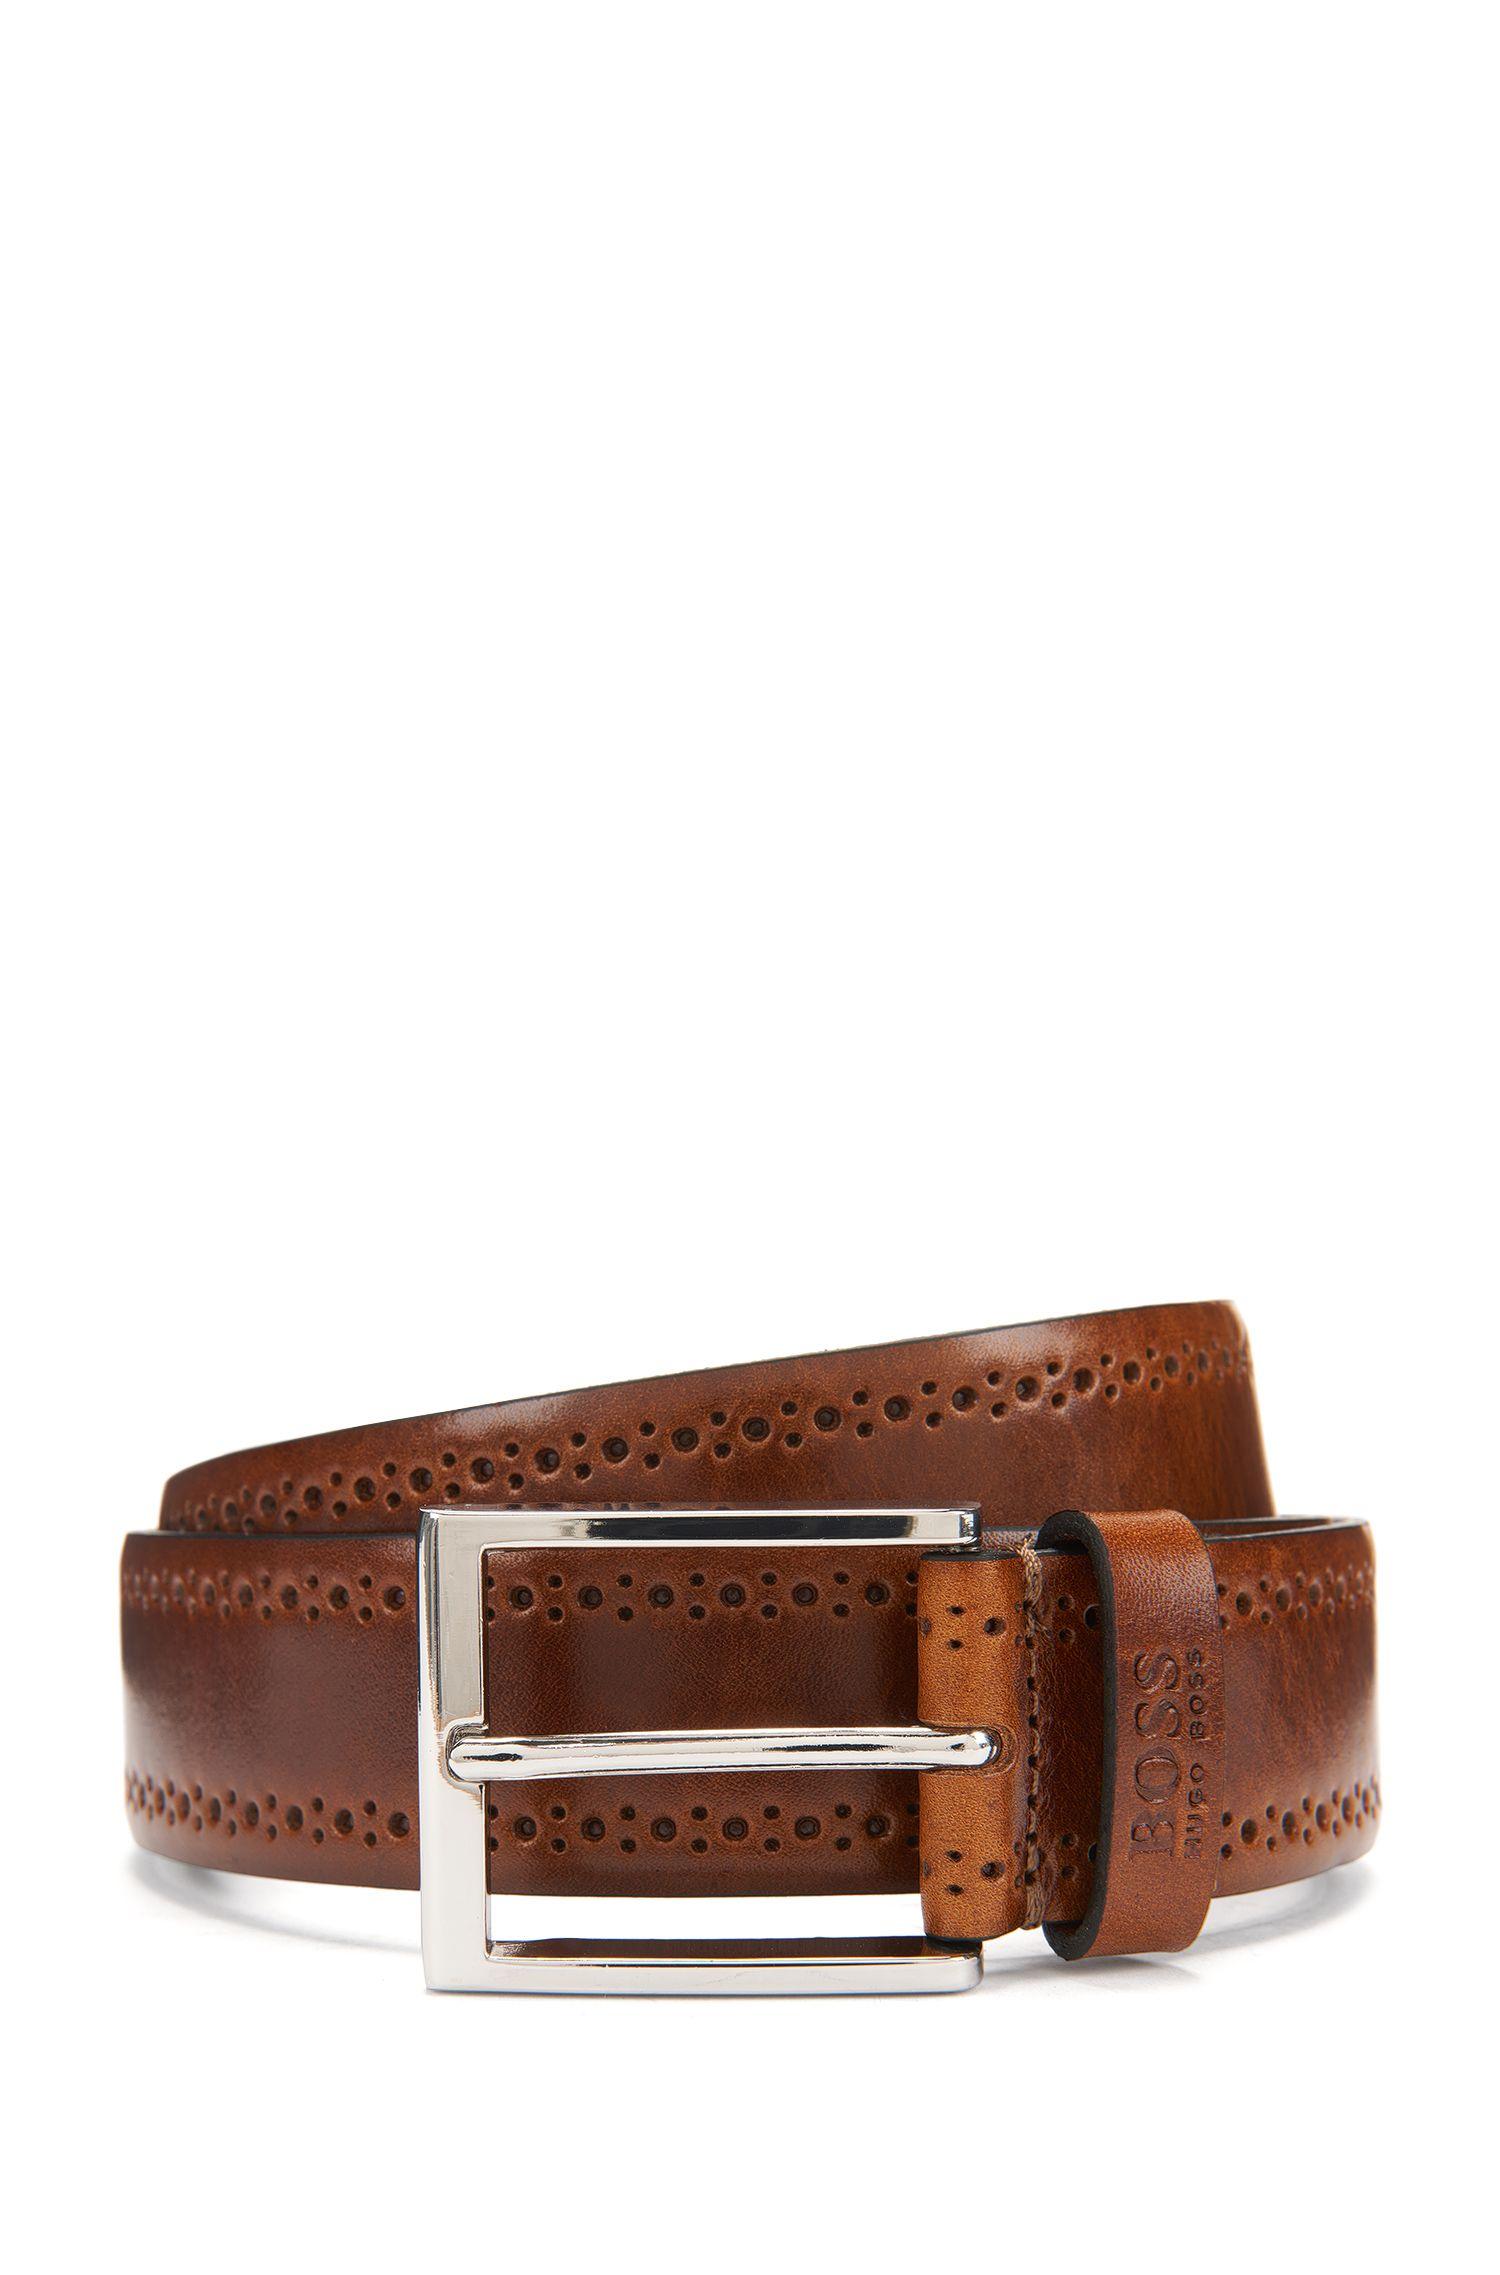 Brogue Leather Belt | Cenol